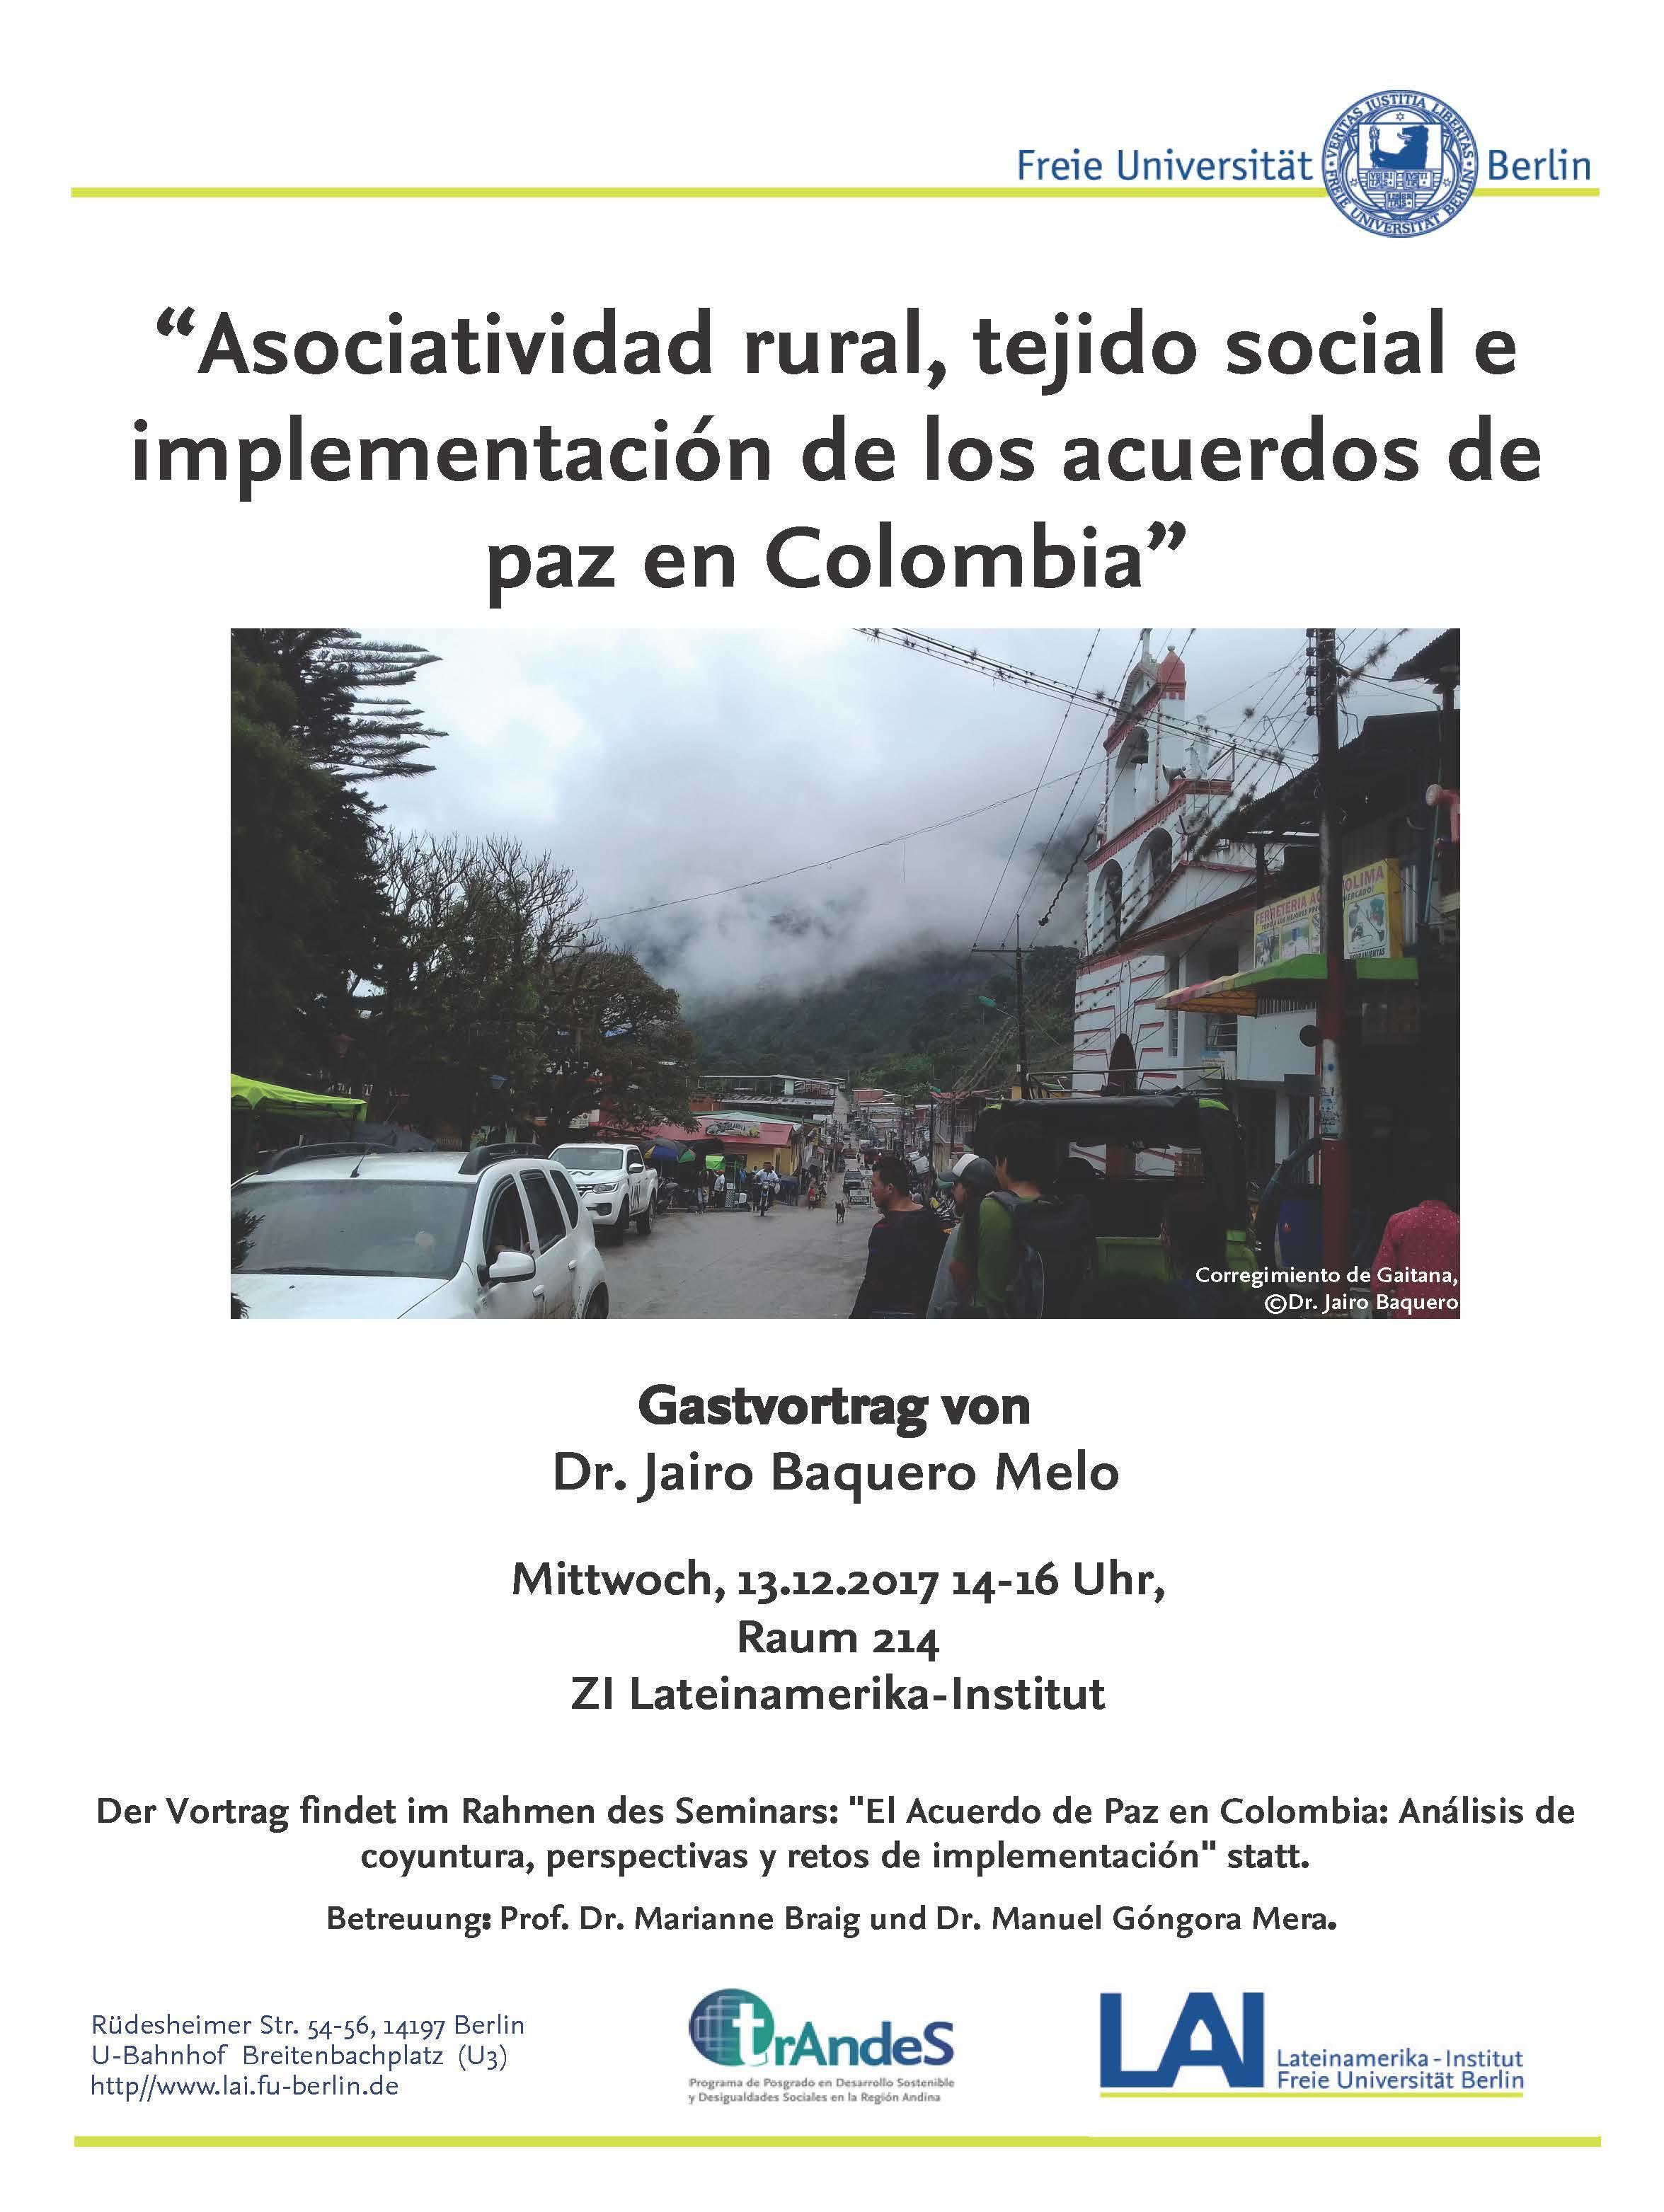 Poster Gastvortrag Dr. Jairo Baquero